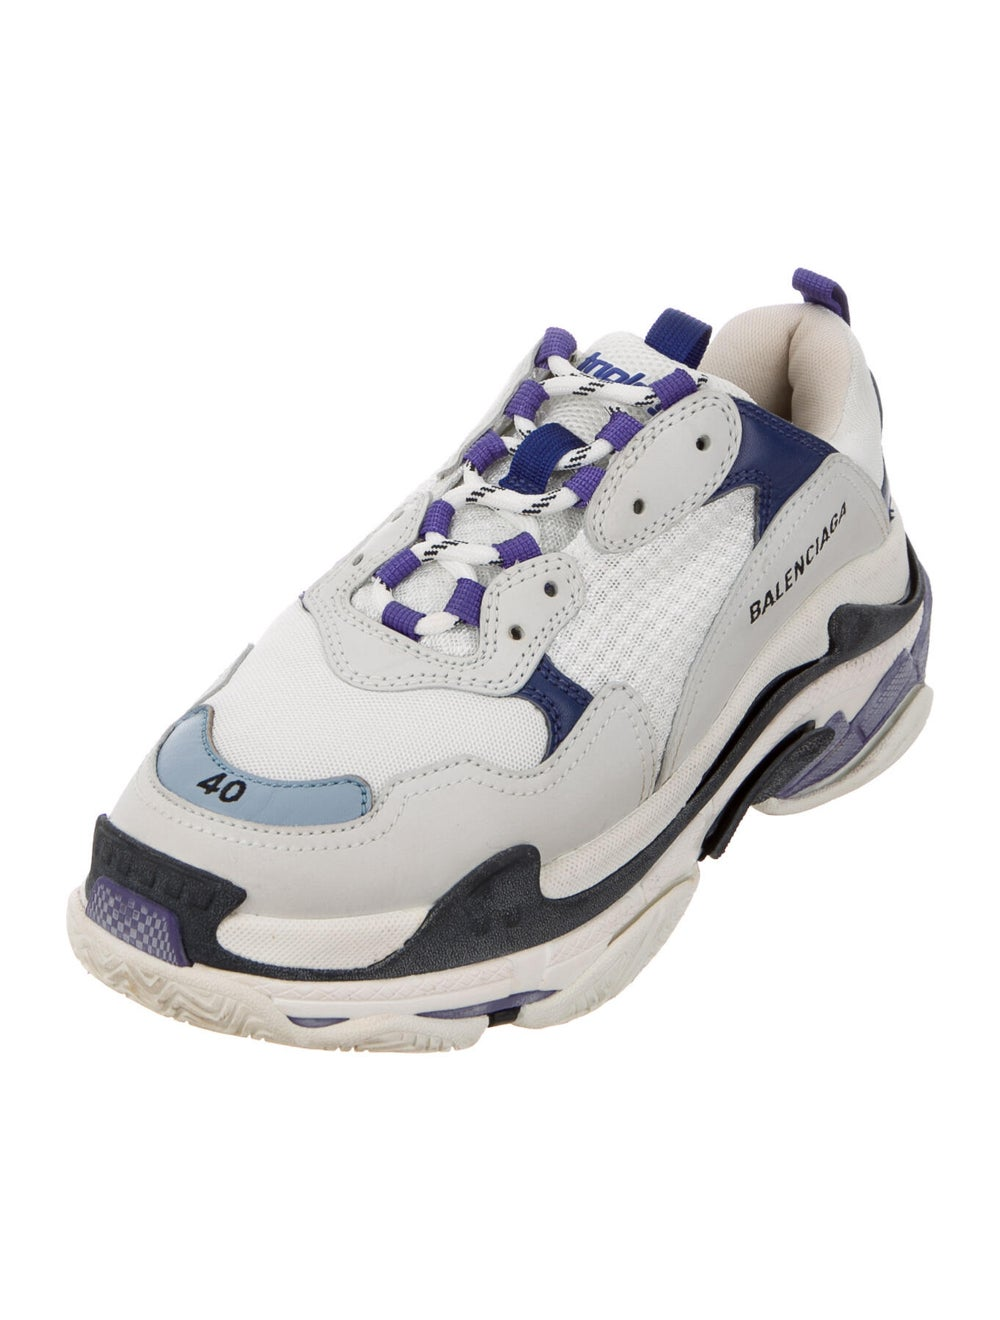 Balenciaga Triple S Chunky Sneakers Blue - image 2